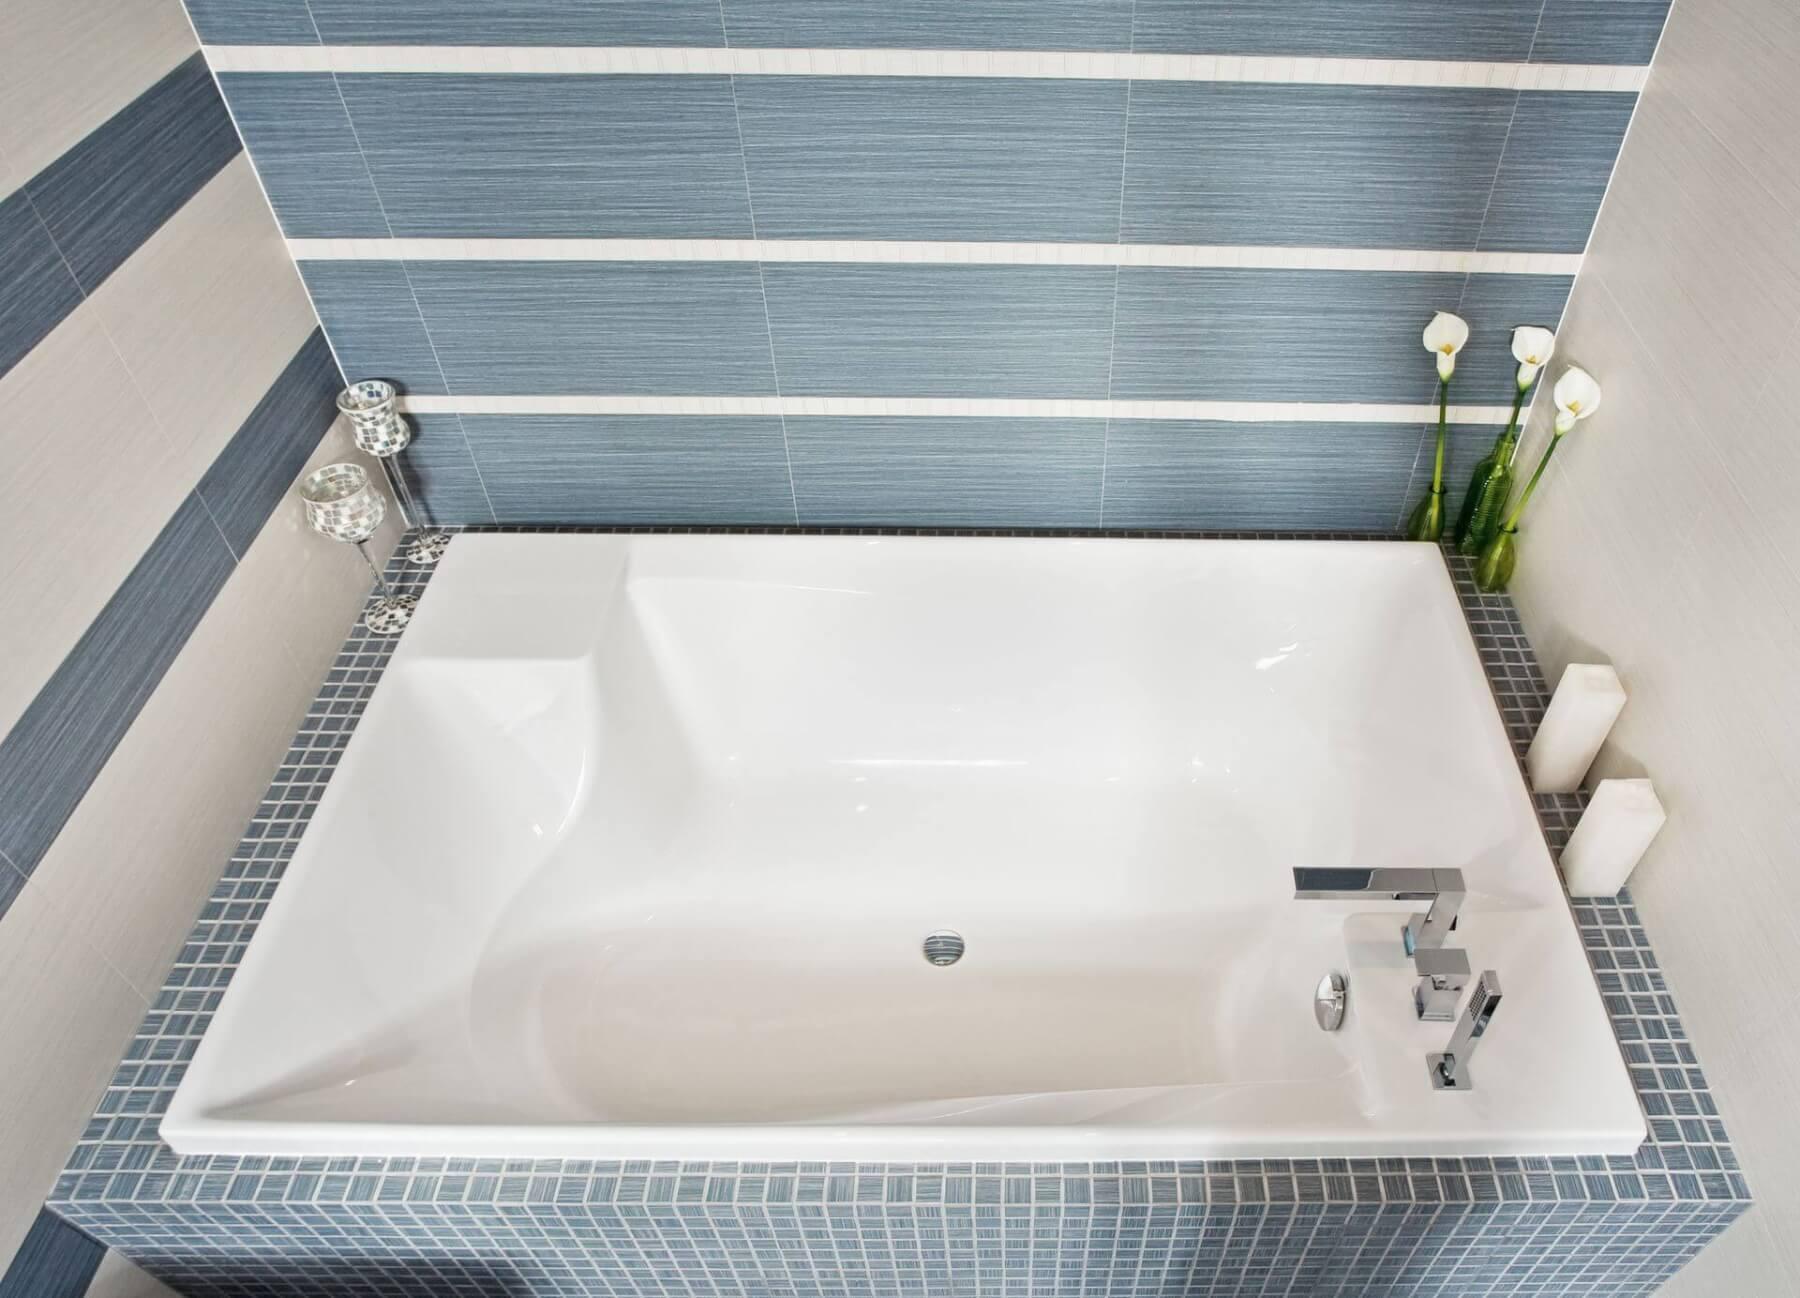 Vasche Da Bagno Moderne : Materiali per vasche da bagno moderne artebagno